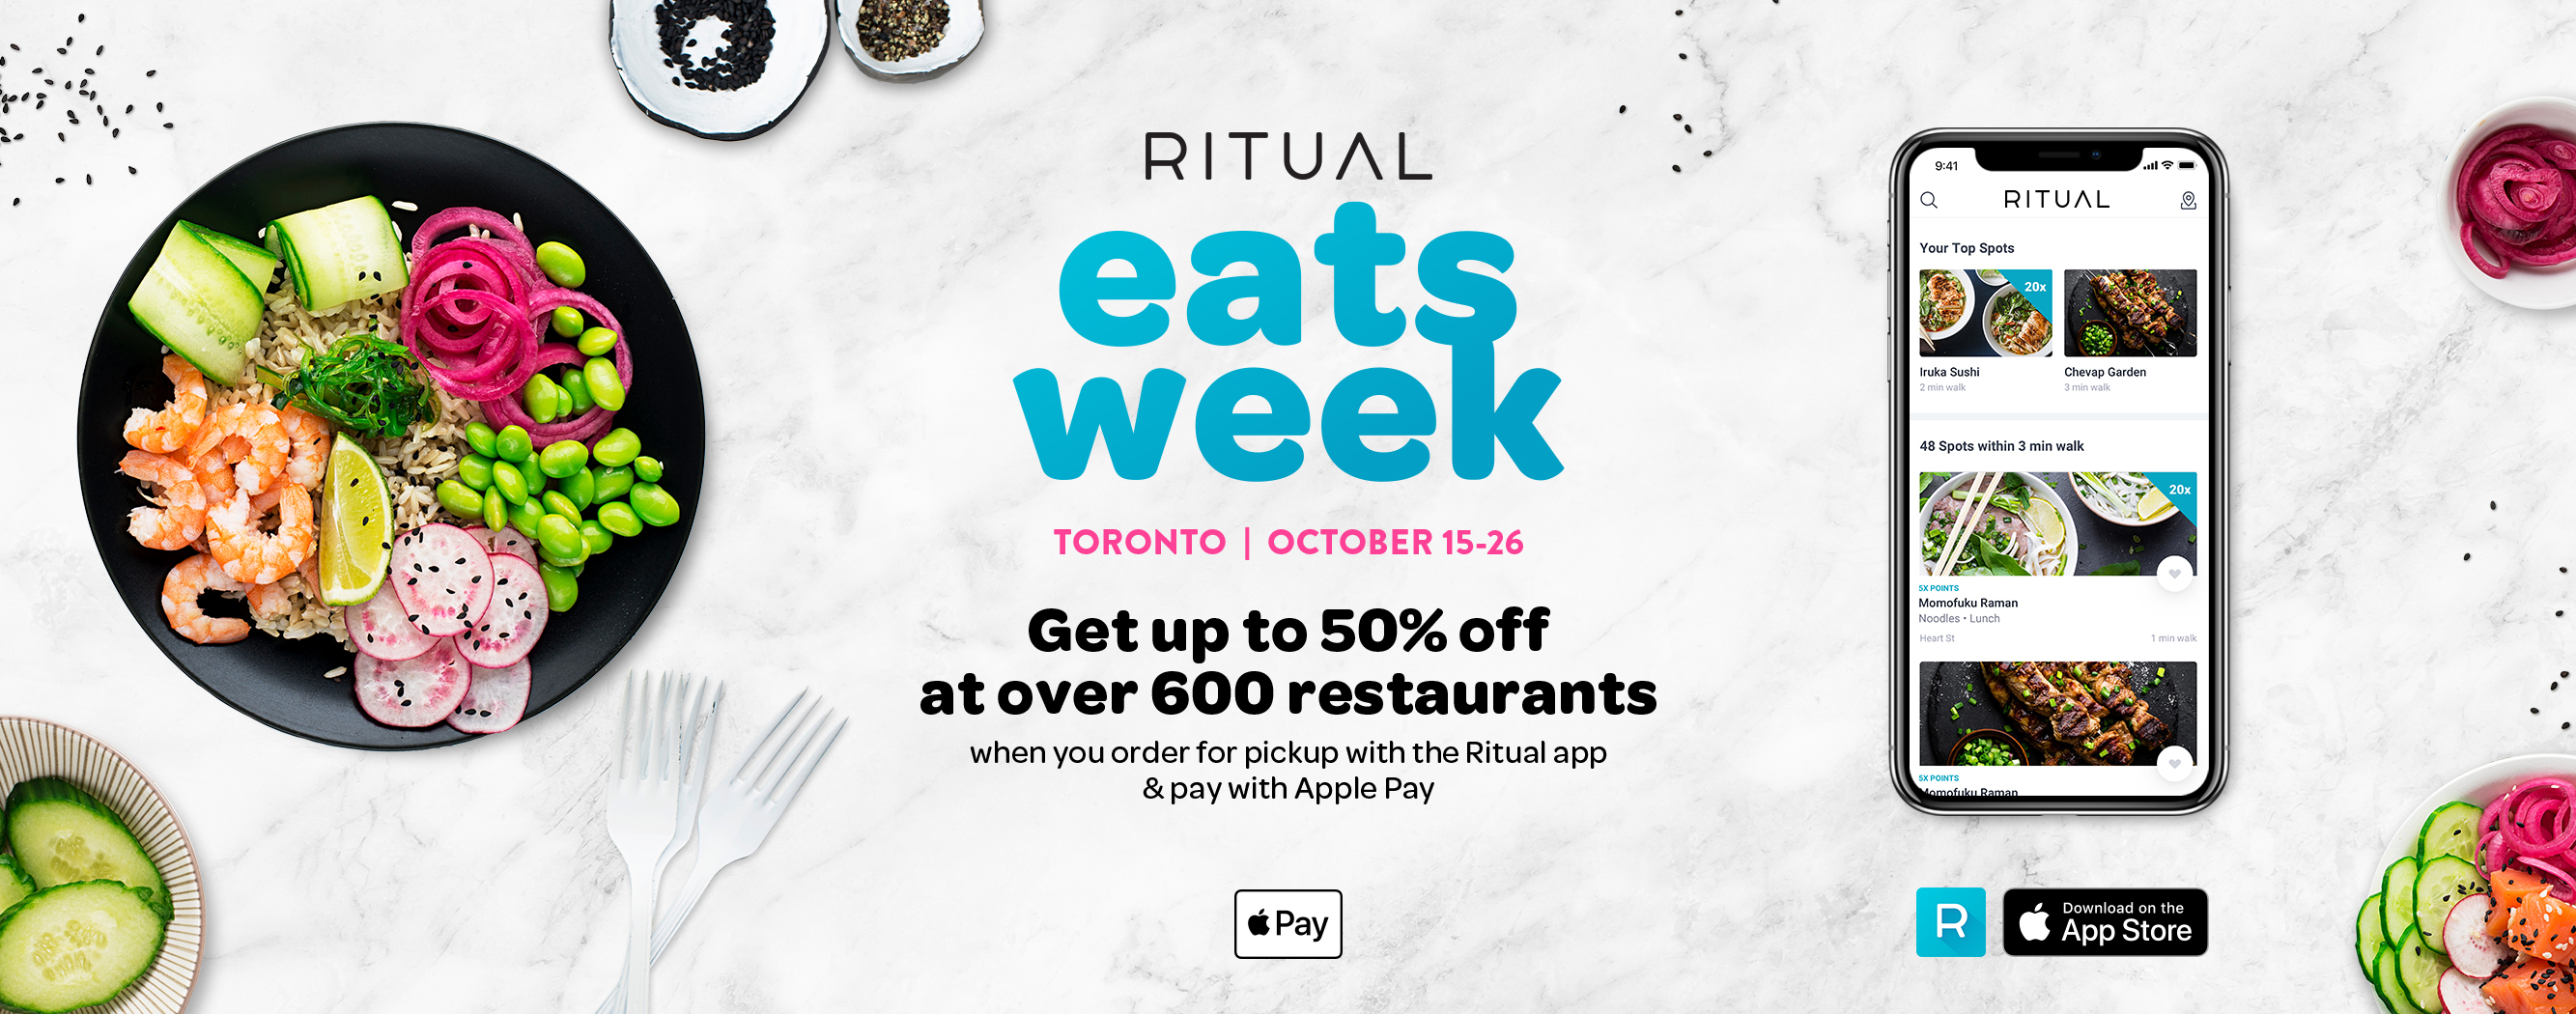 Ritual Eats Week Toronto